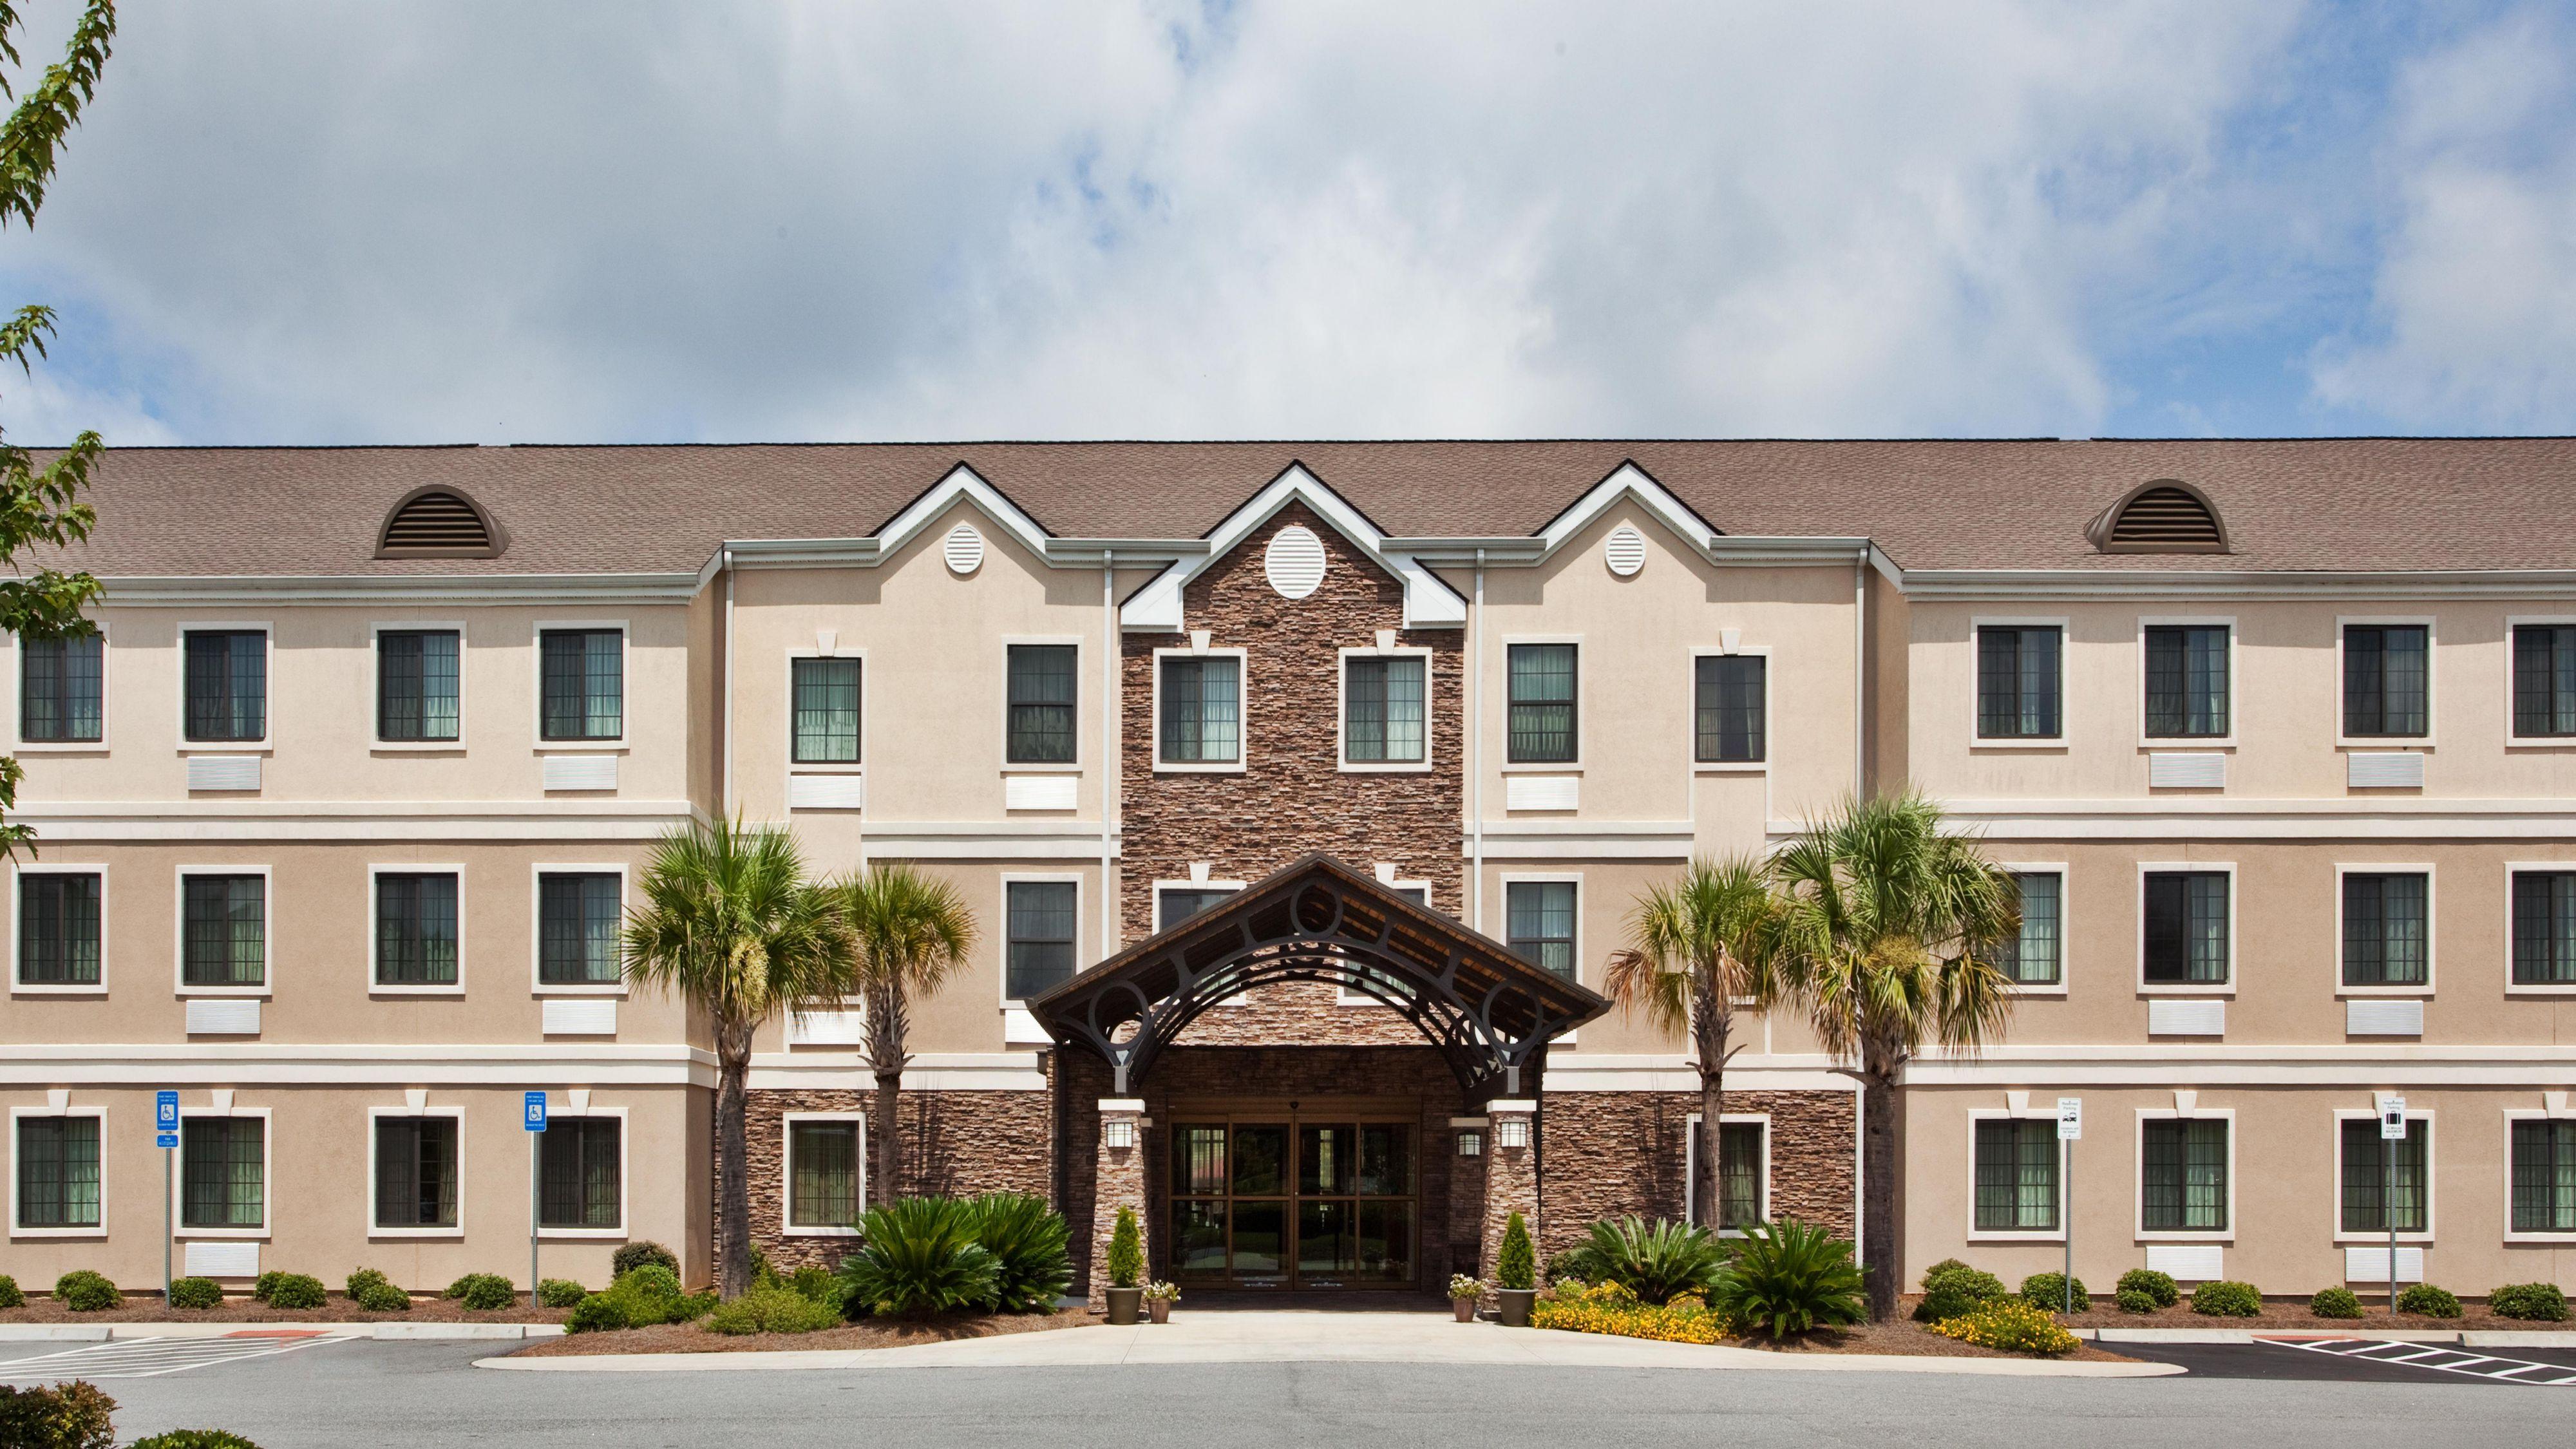 Savannah Hotels: Staybridge Suites Savannah Airport